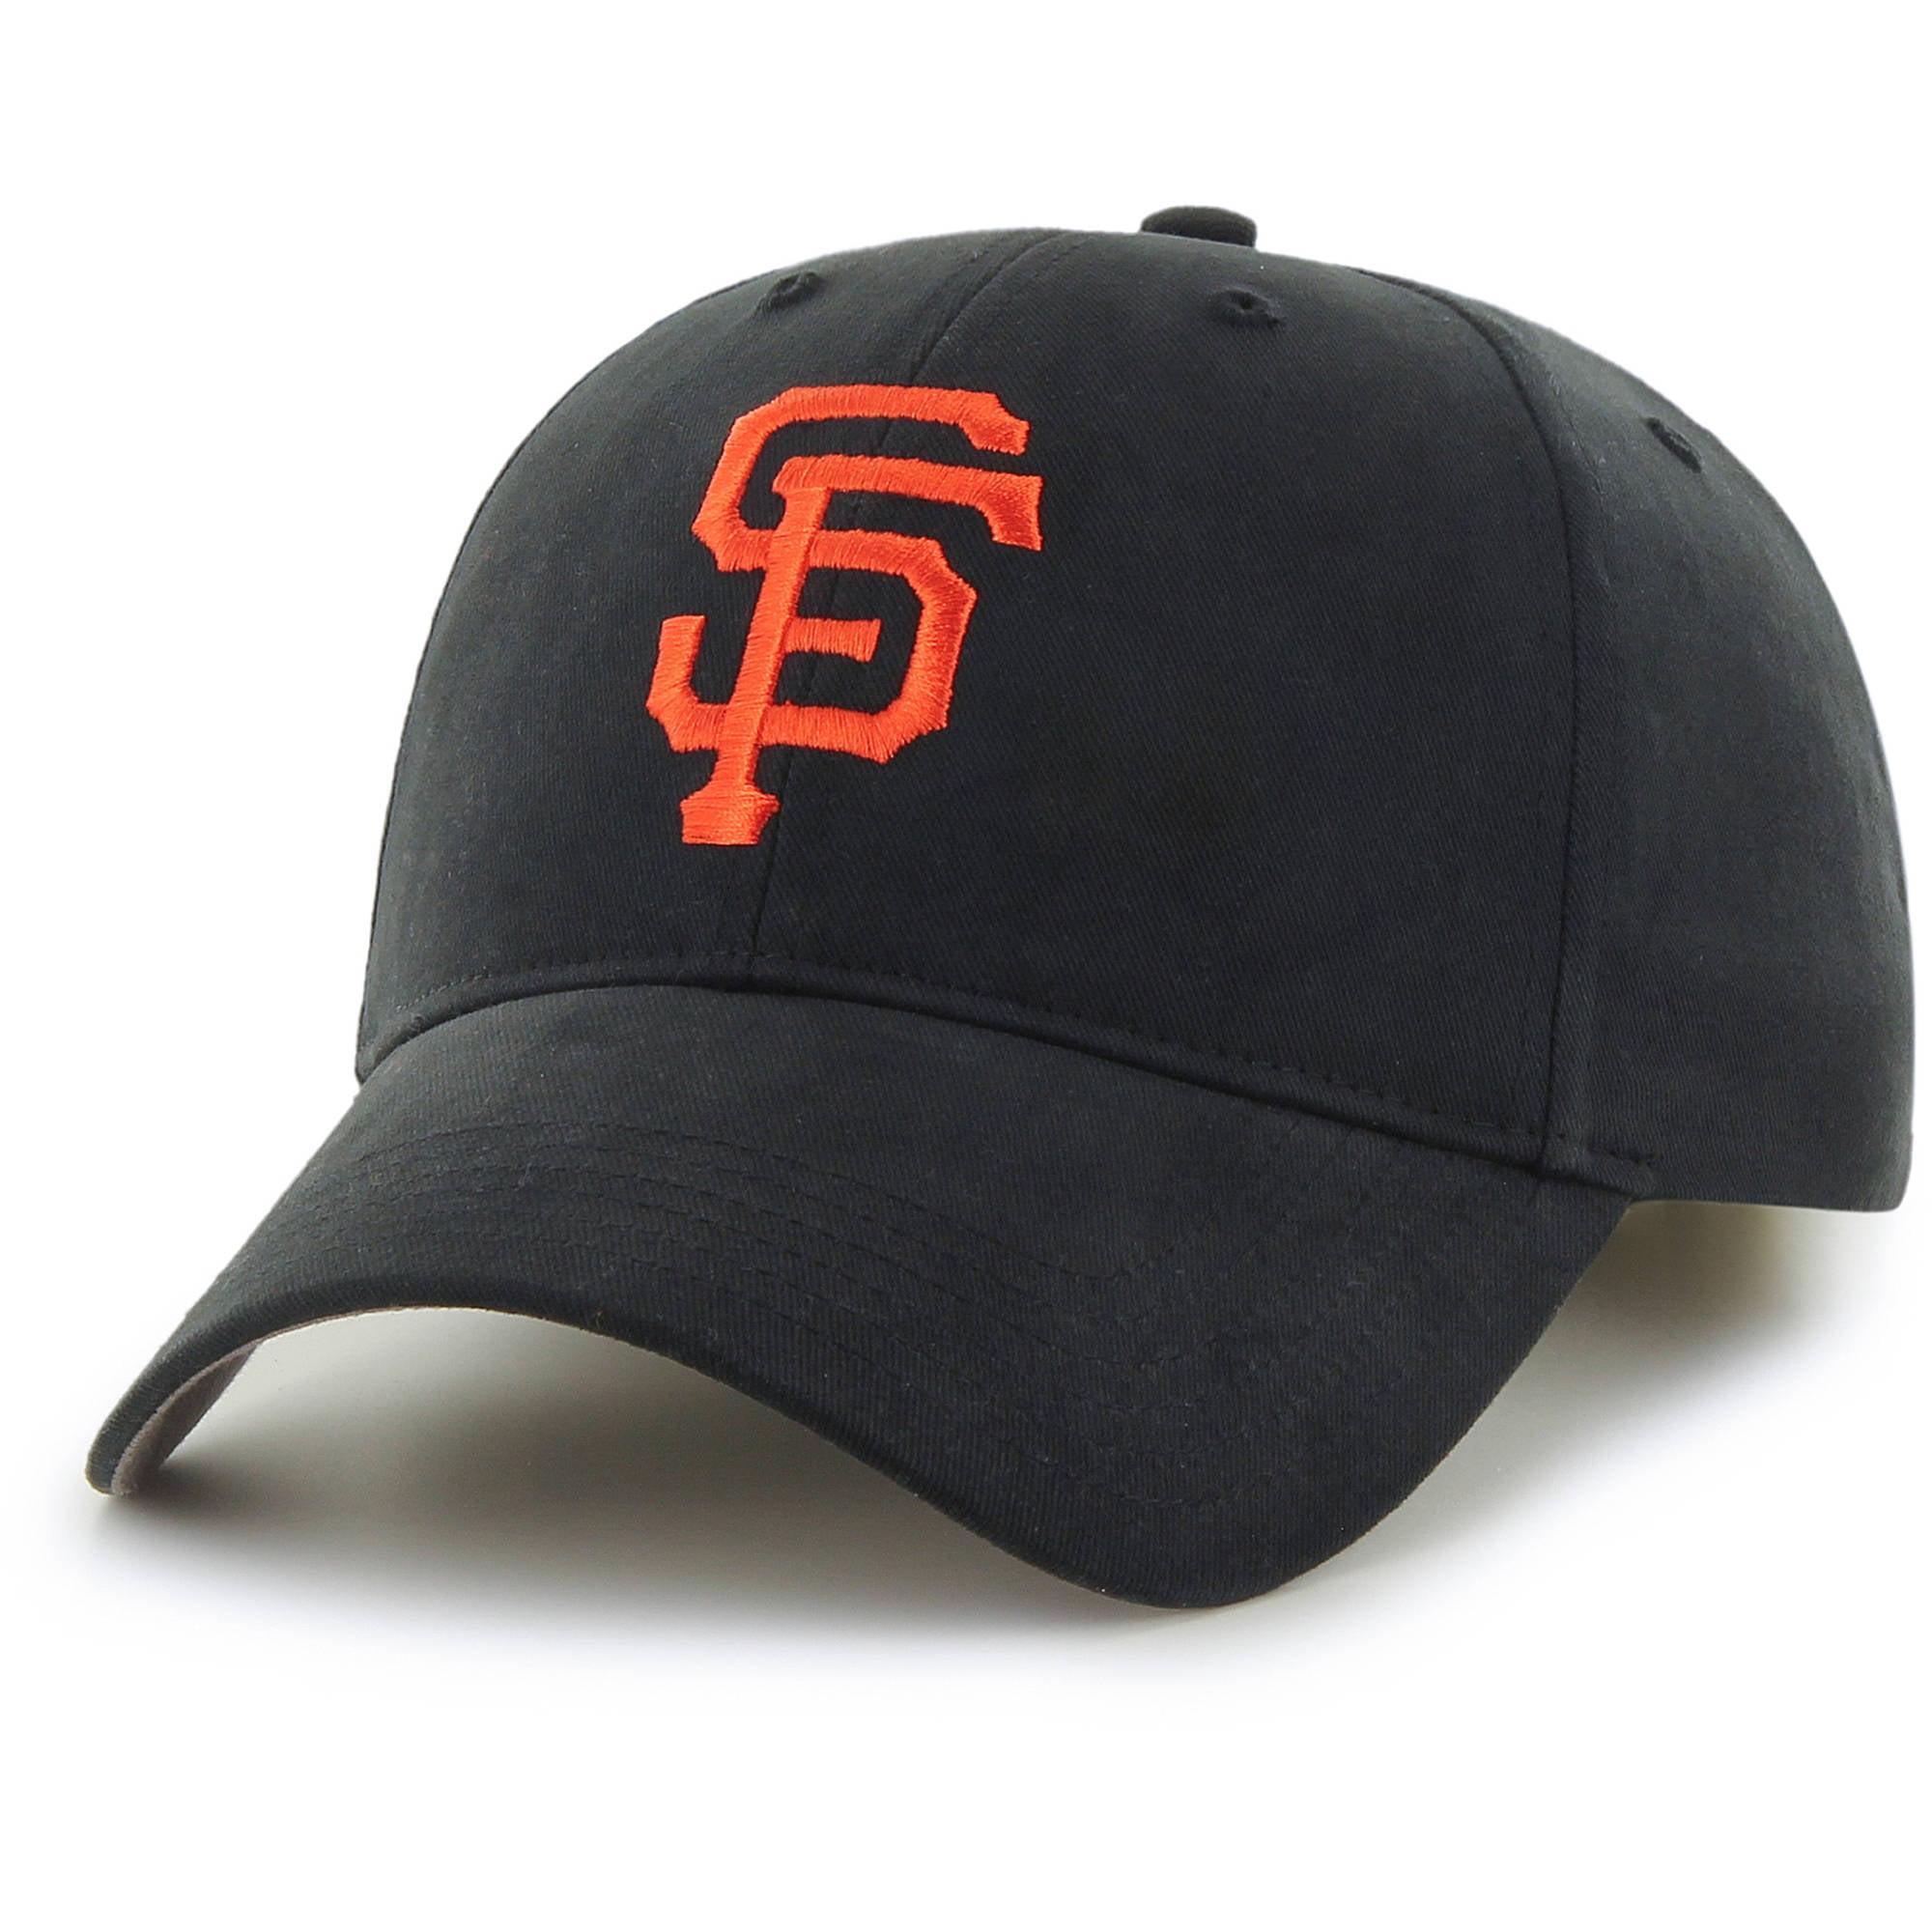 Fan Favorite - MLB Basic Cap, San Francisco Giants